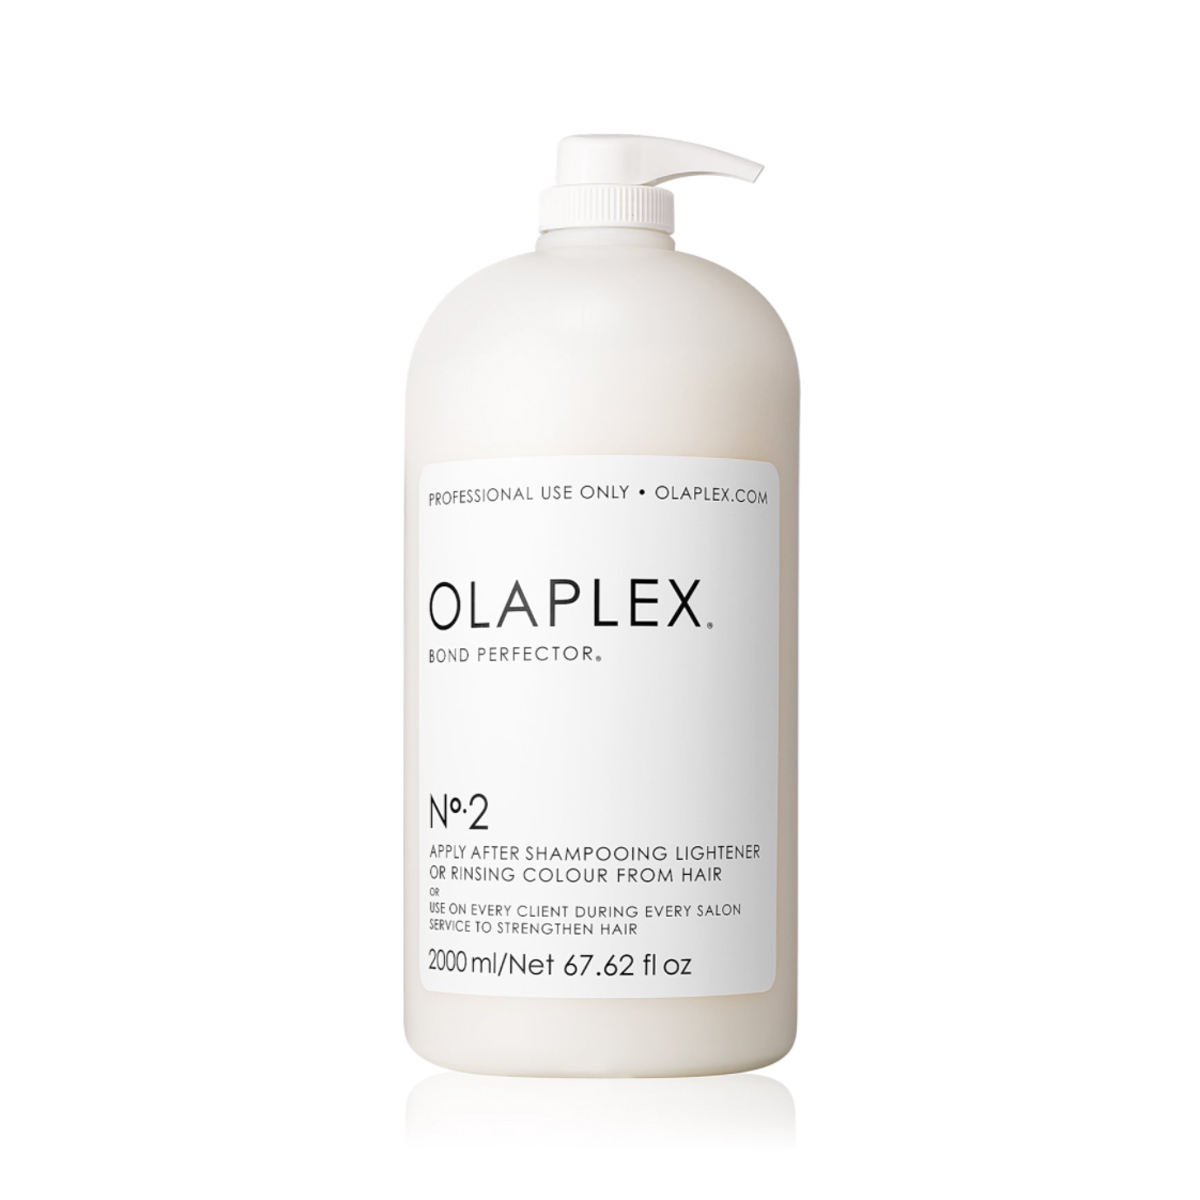 Olaplex N2 Bond Perfector